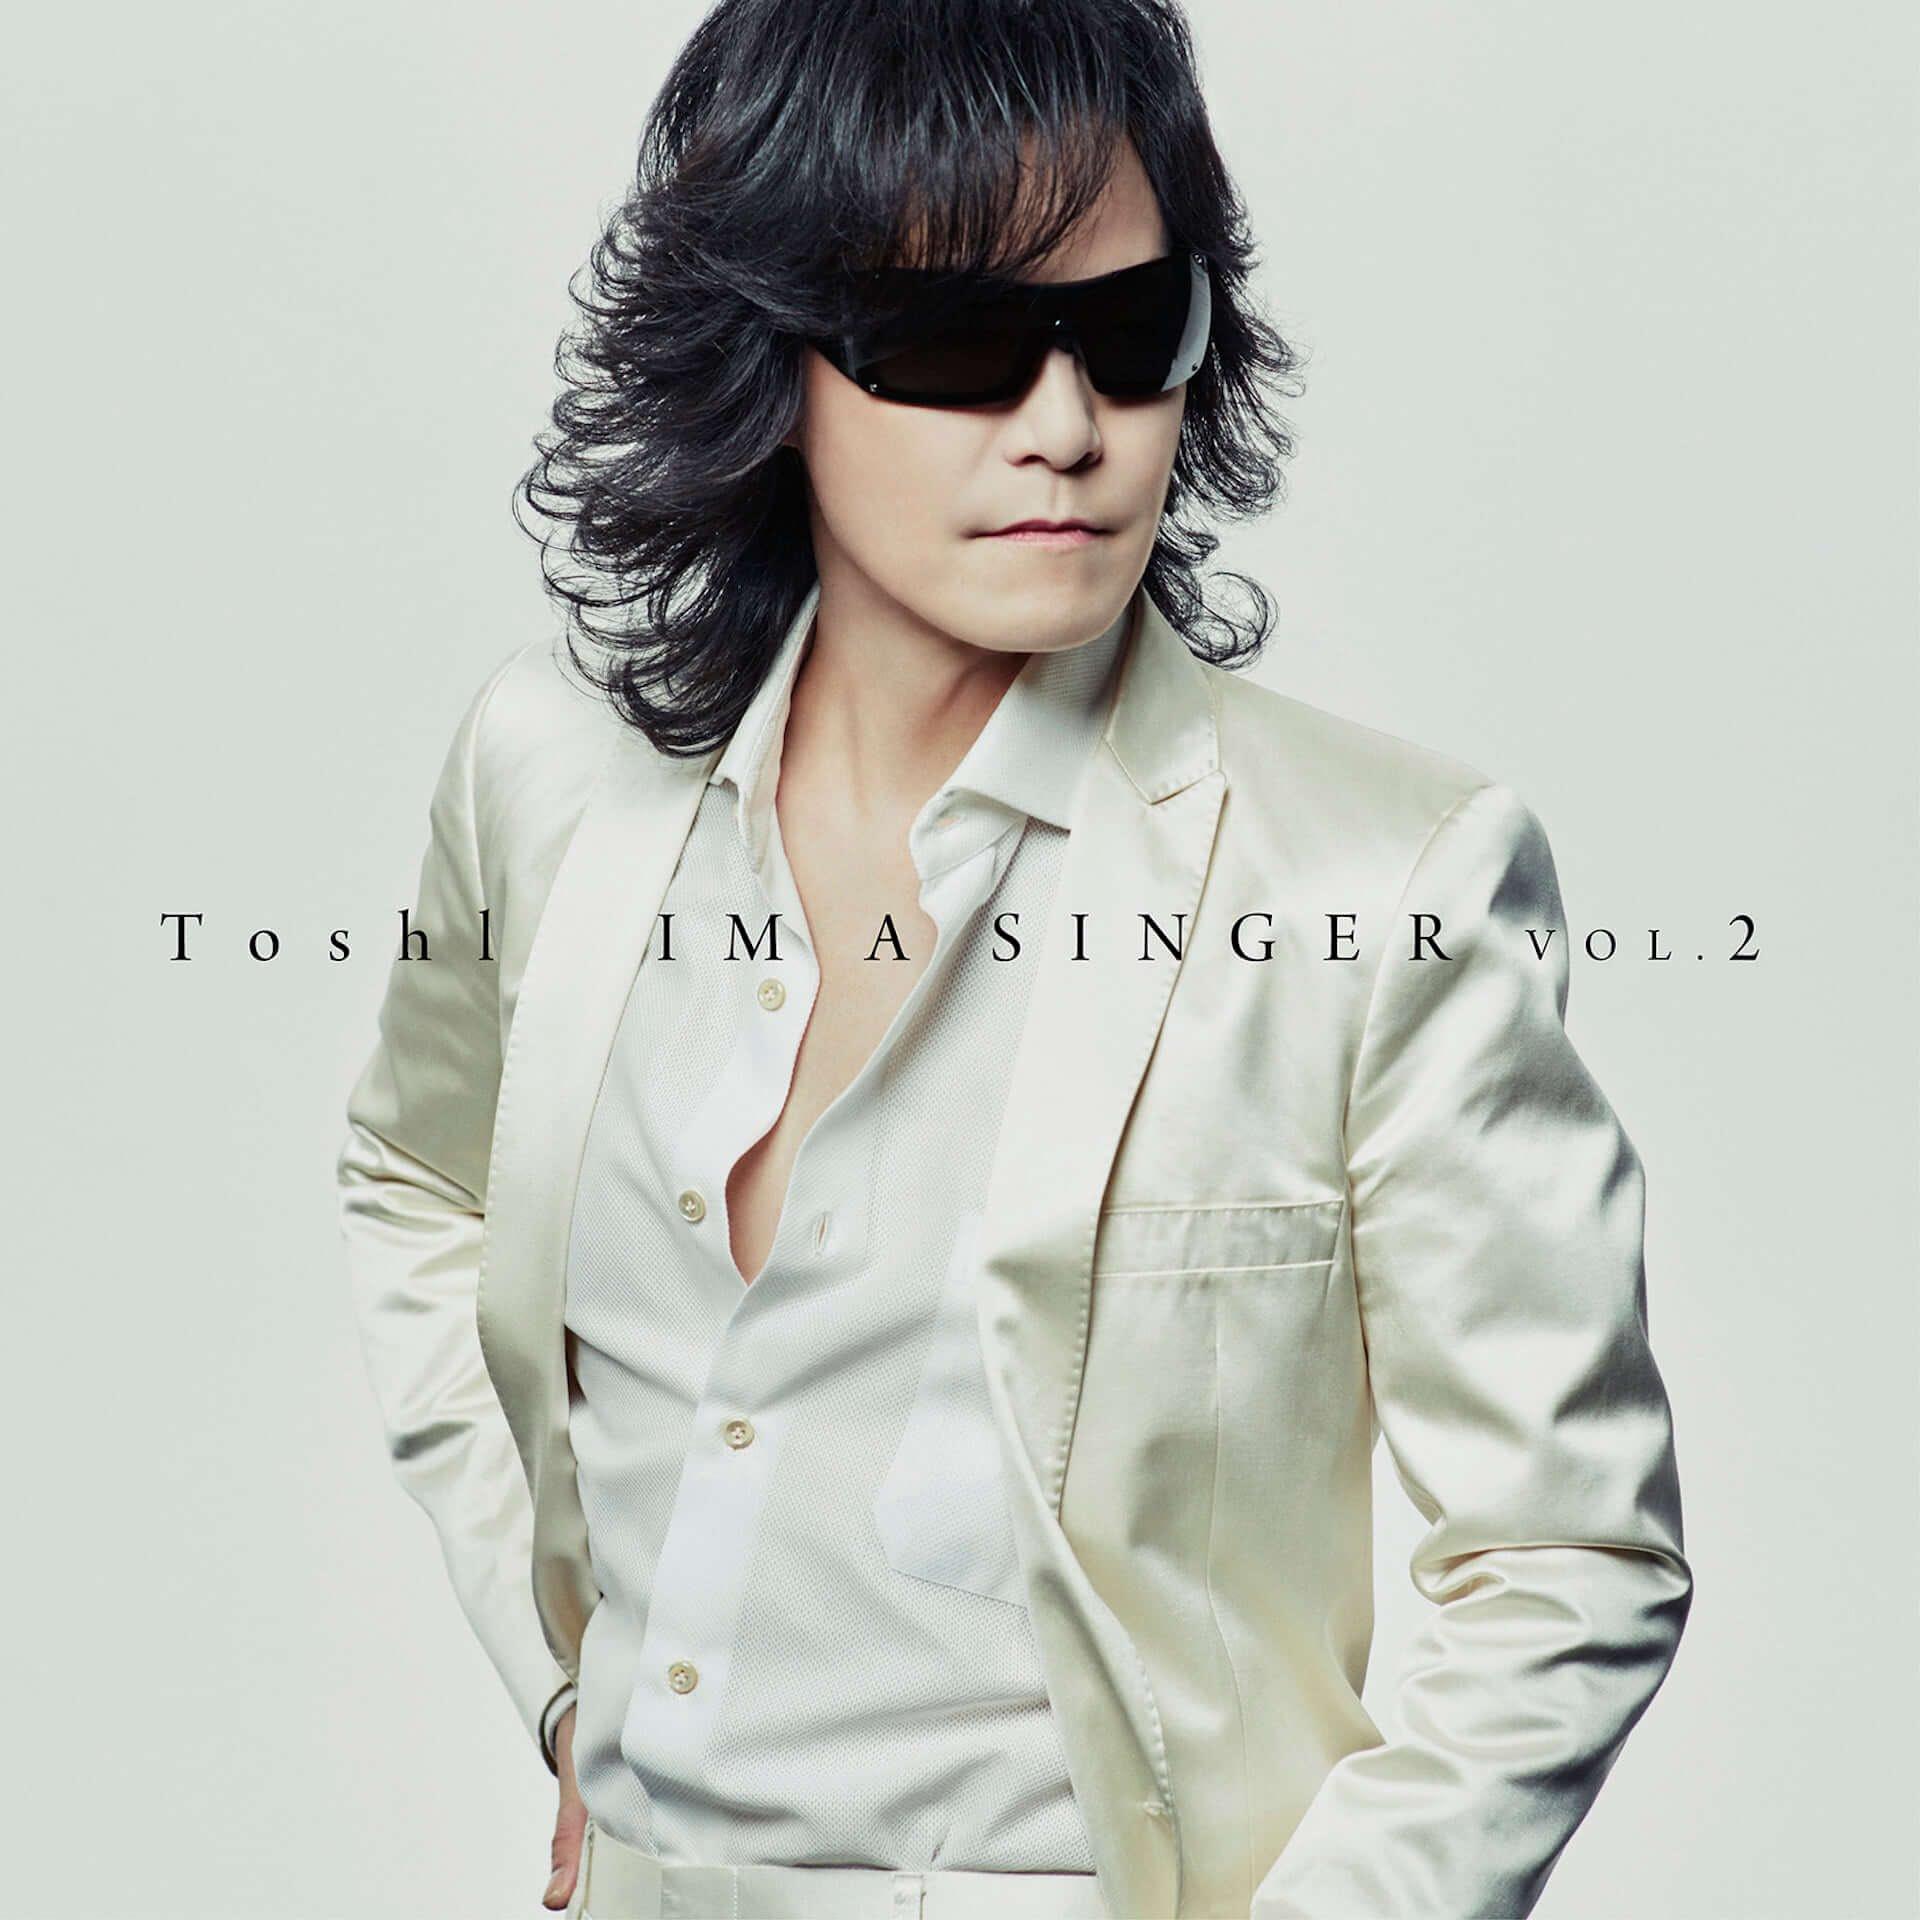 ToshI I'm a singer vol. 2